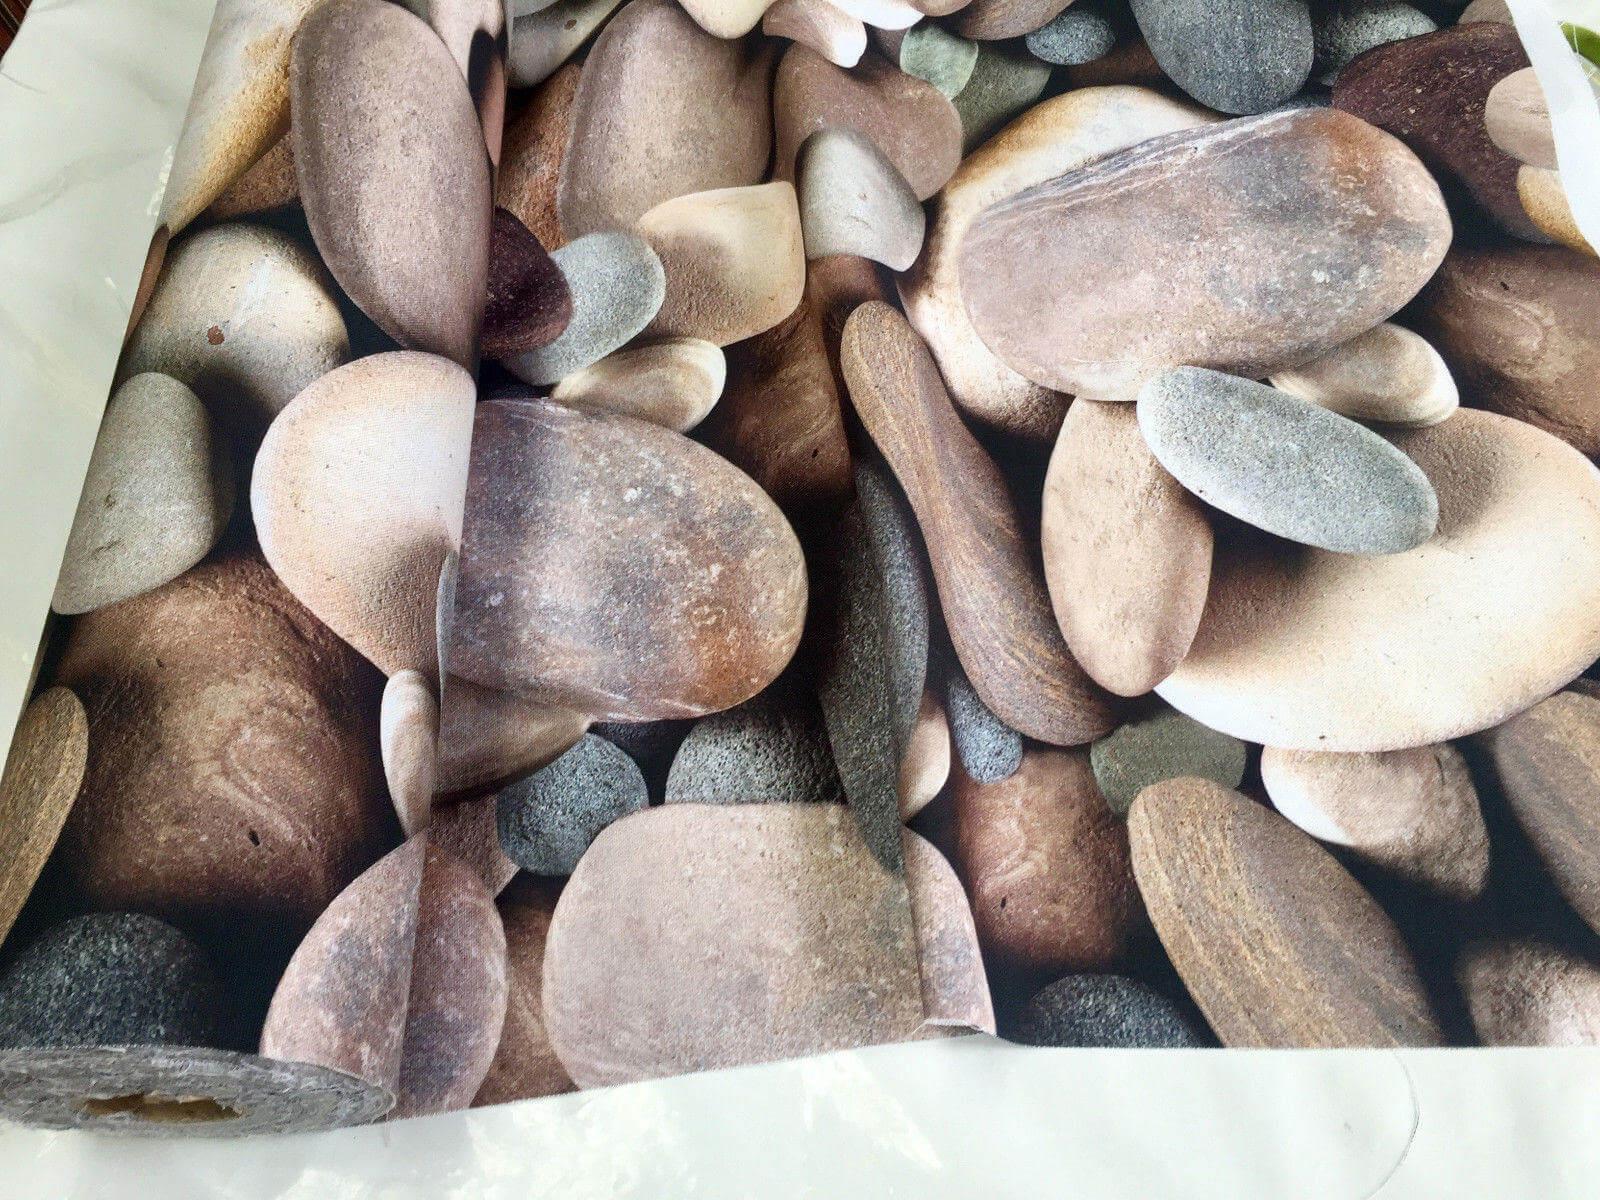 large-stones-beach-pebbles-print-cotton-fabric-curtain-upholstery-decor-material-140cm-wide-brown-grey-5b87d5fb1.jpg